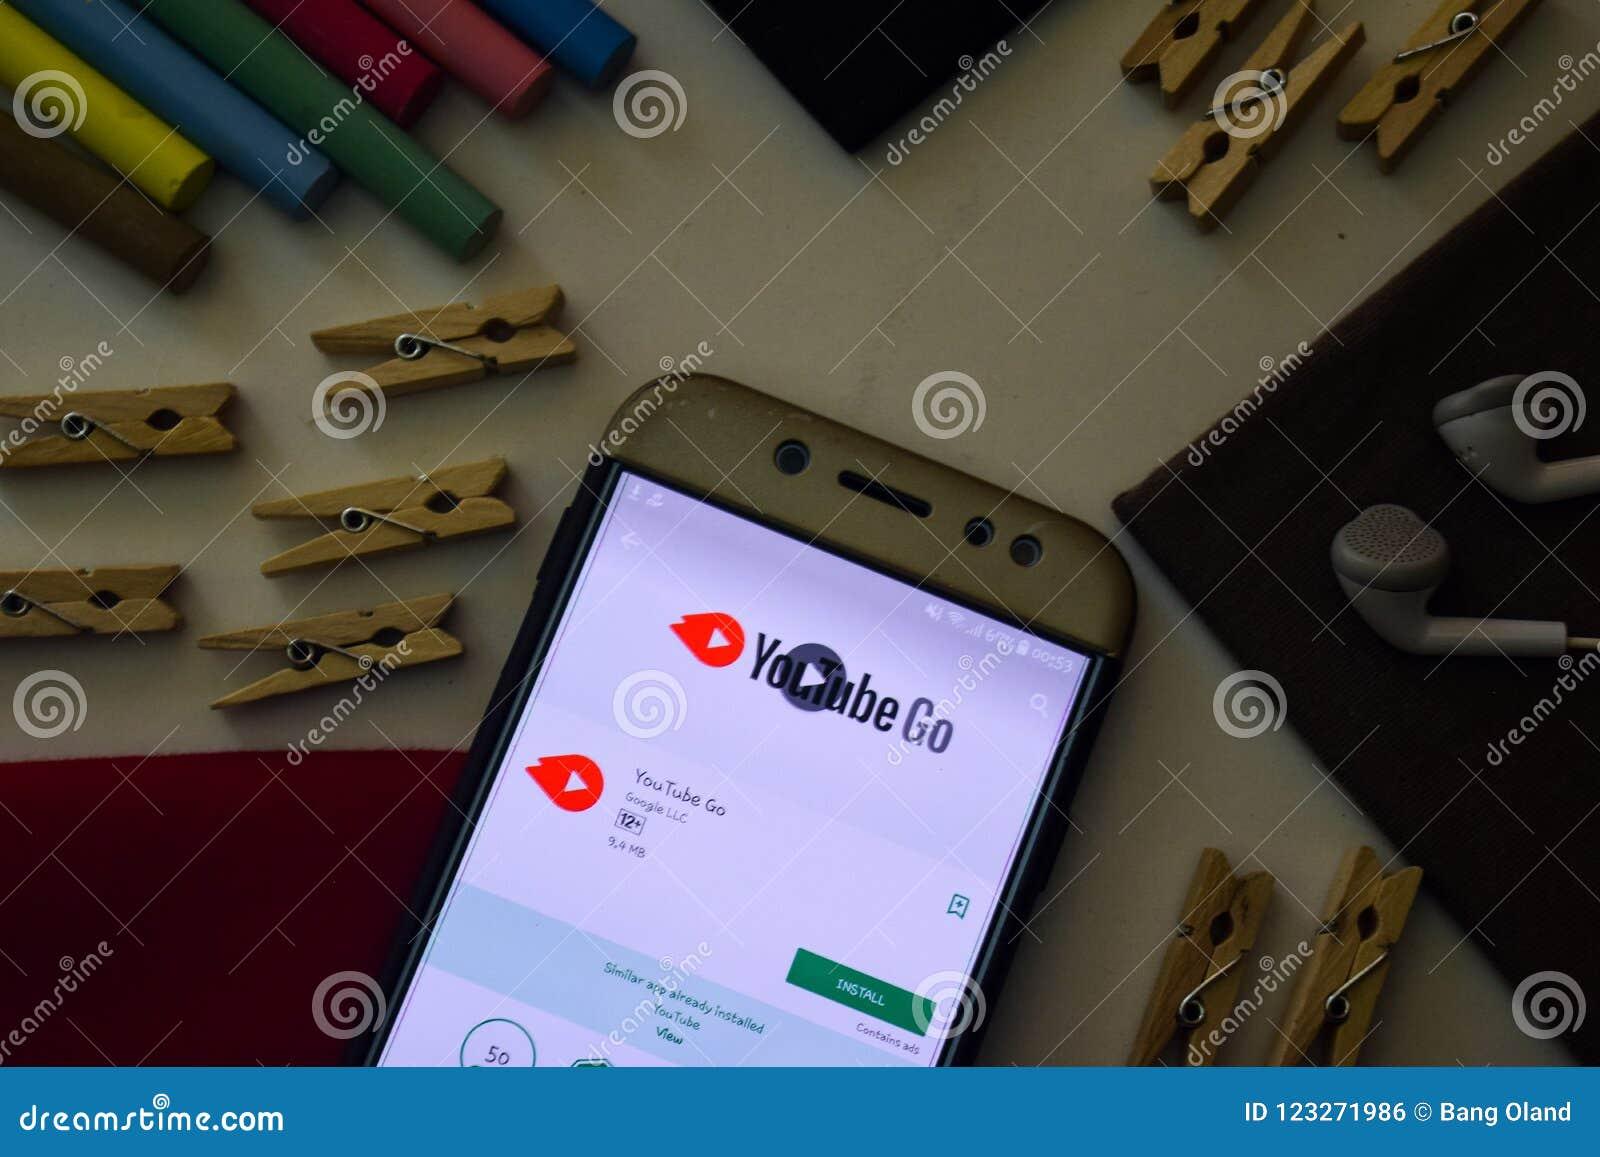 youtube java app